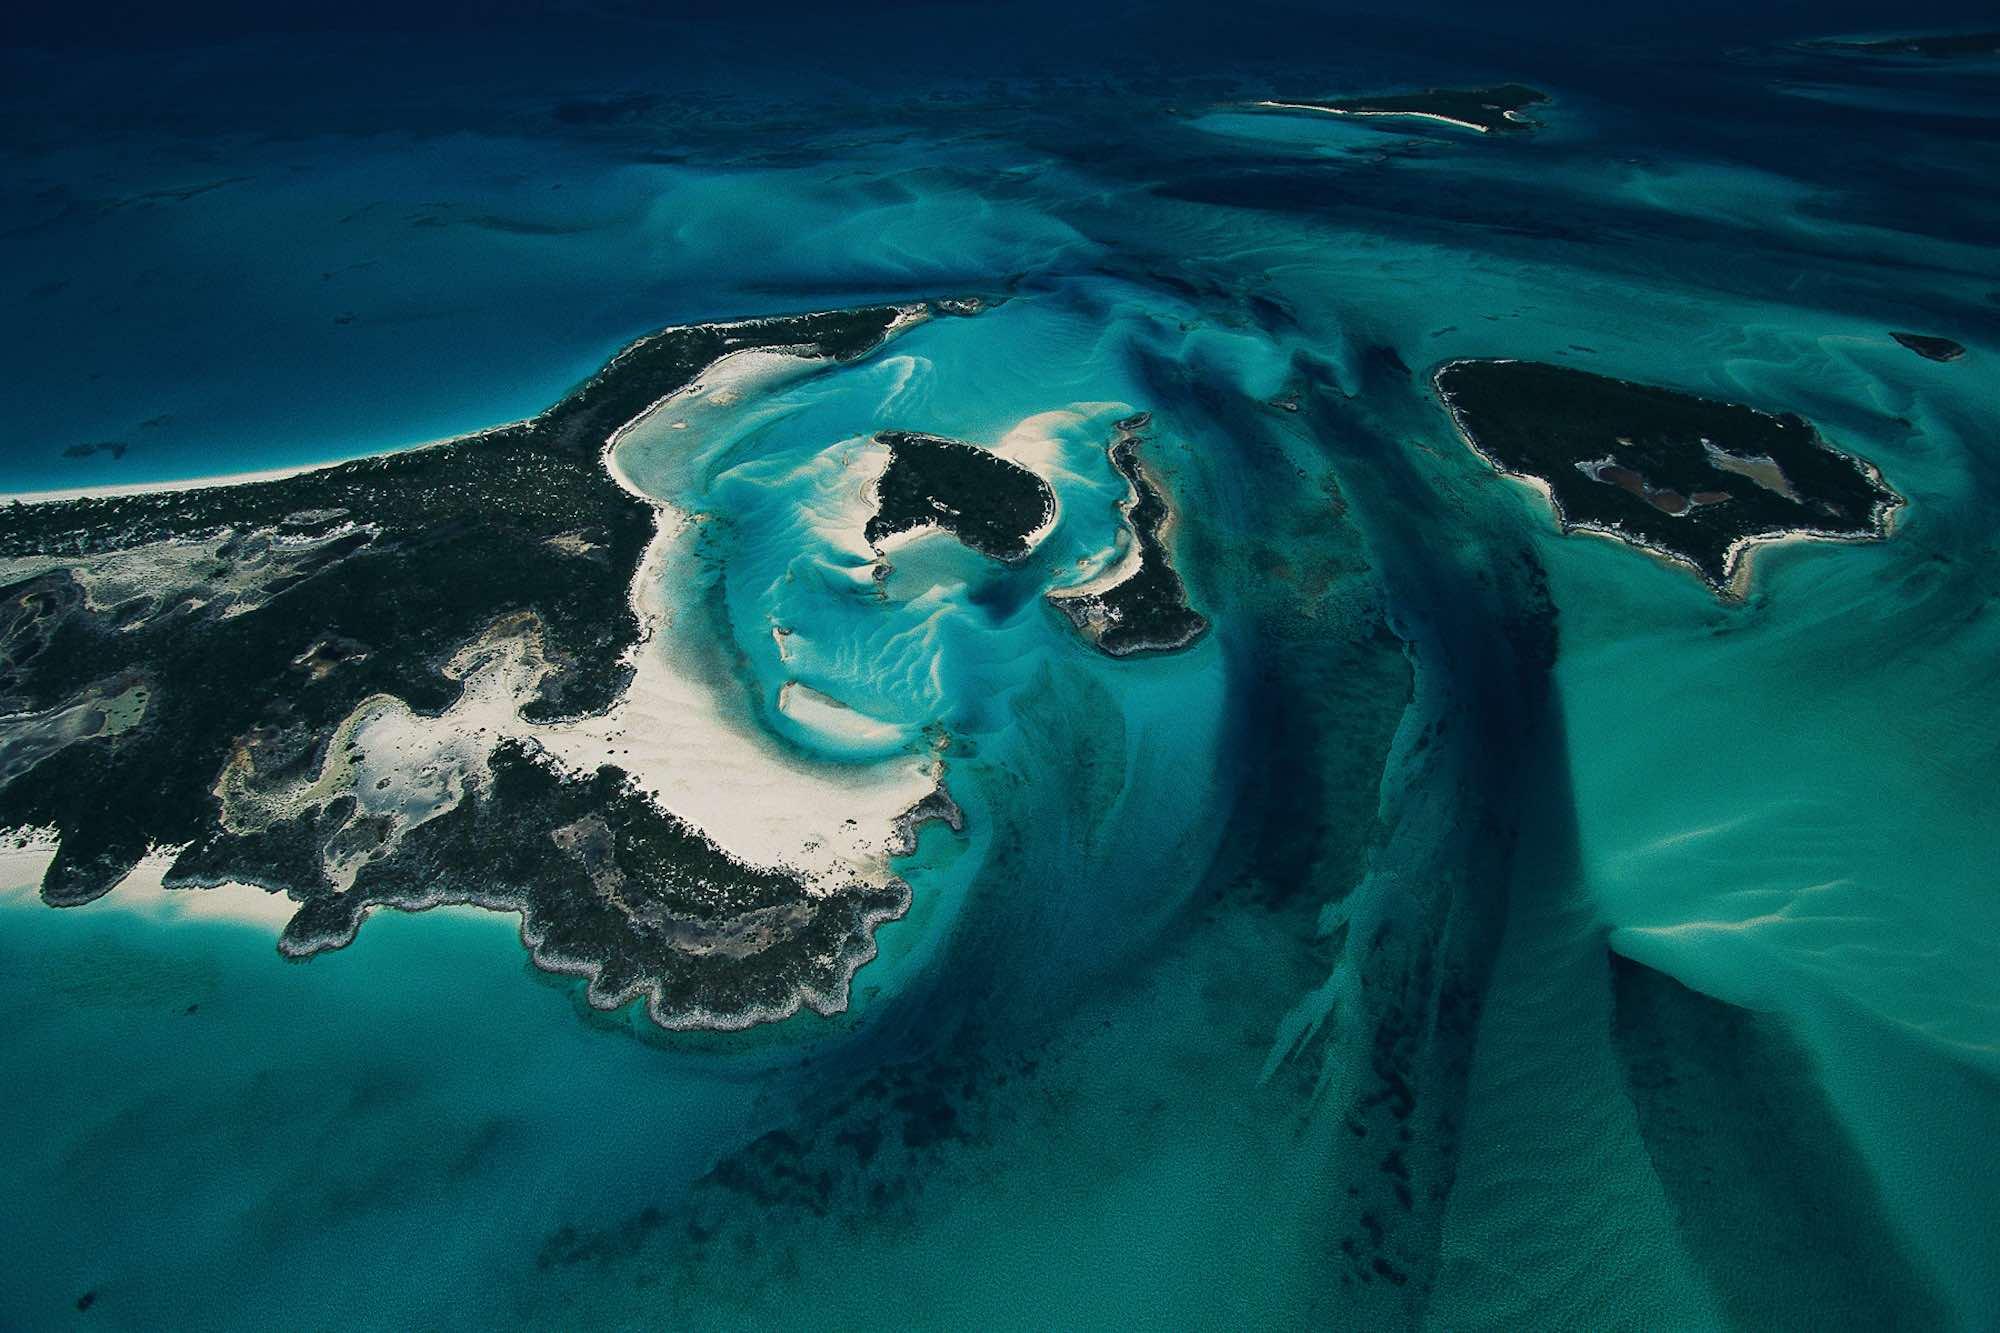 Islet and sea bed - Yann Arthus-Bertrand